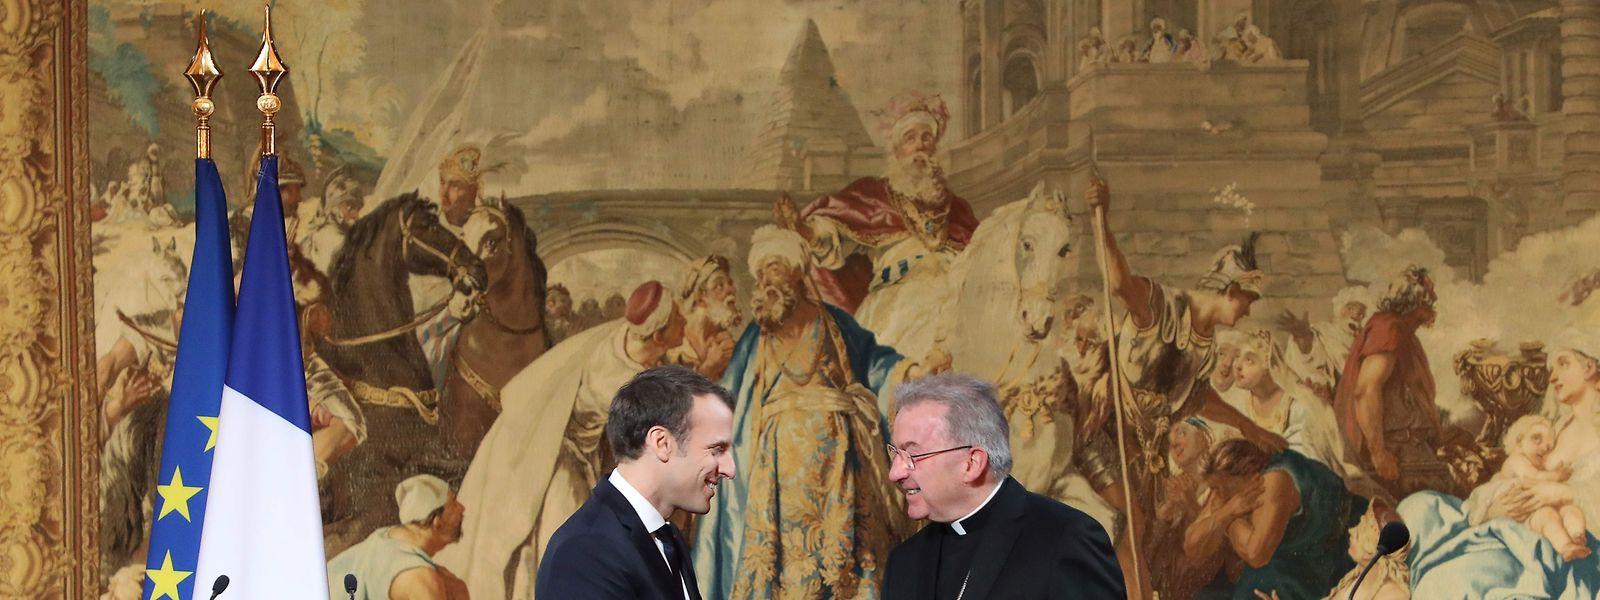 O cardeal Luigi Ventura a cumprimentar o Presidente francês, Emmanuel Macron.